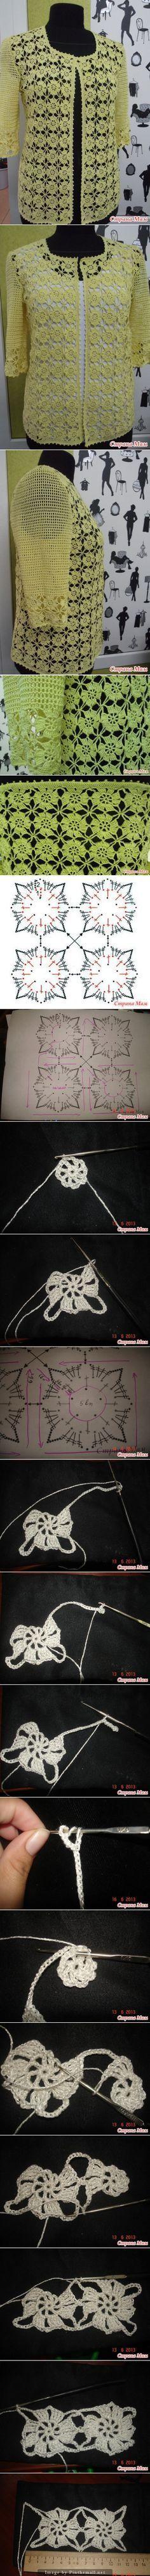 Crochet motif top pullover jacket. http://www.liveinternet.ru/users/tanya_belyakova/post322493207/